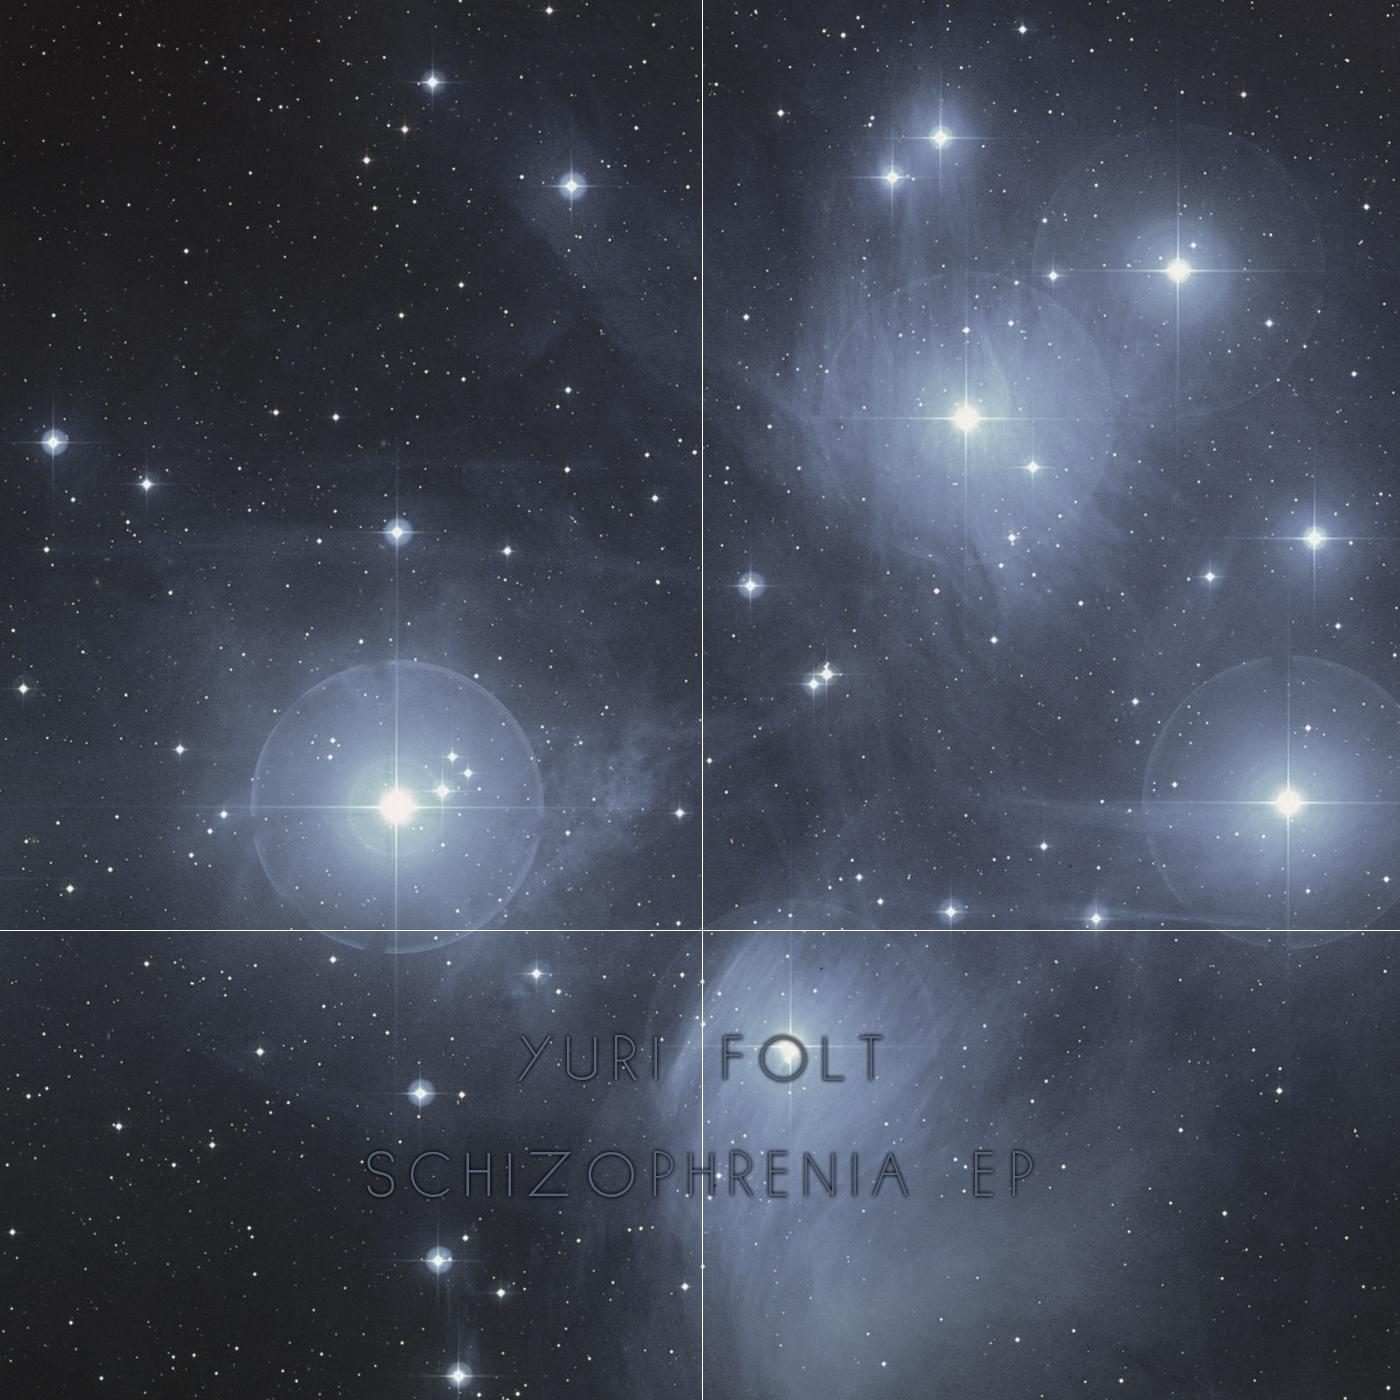 Yuri Folt - Storytellers (Original mix)